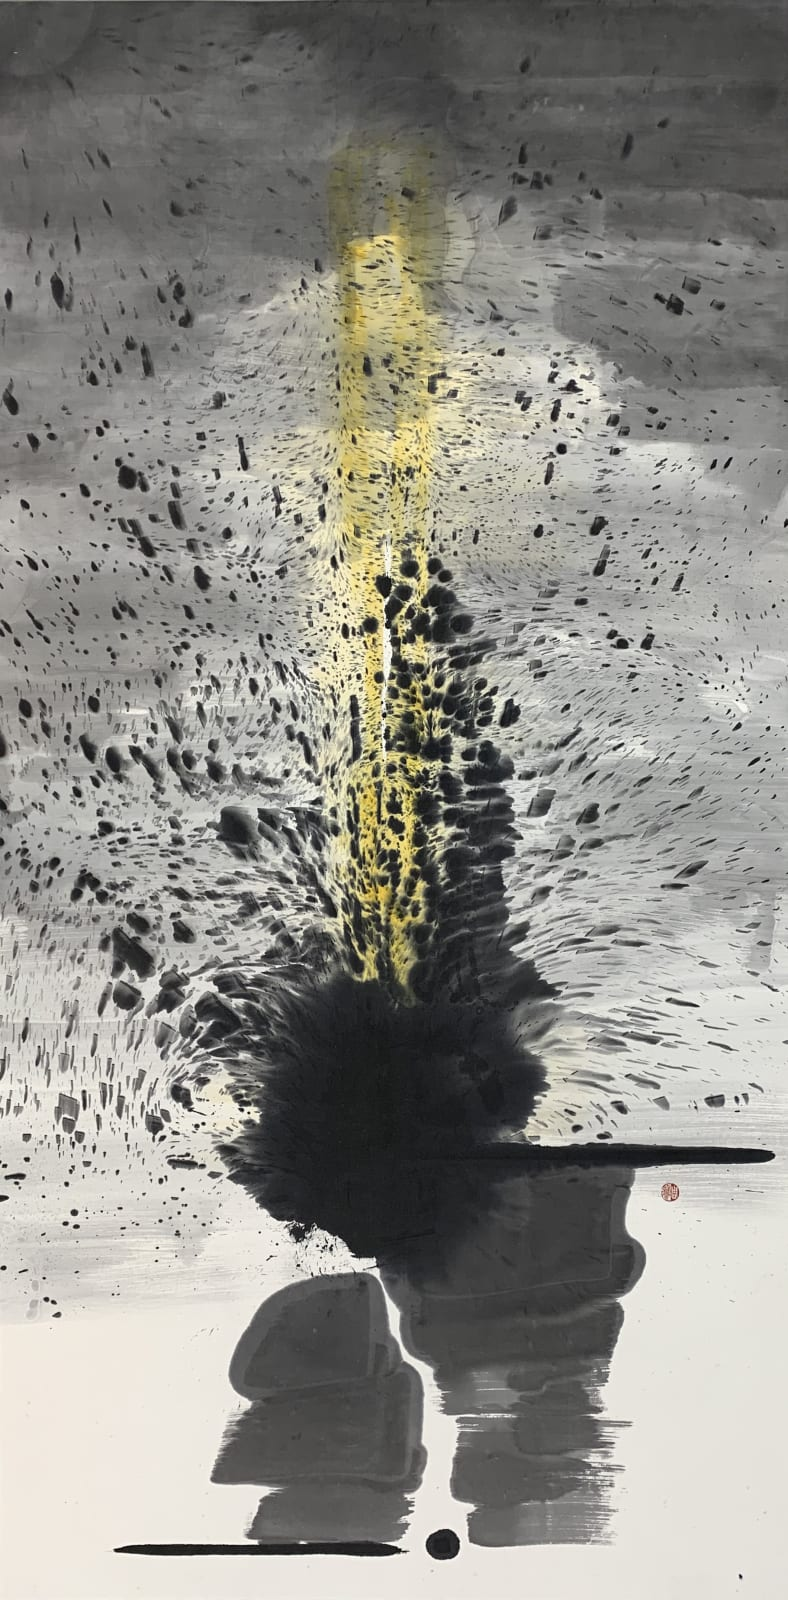 Chou Lu Yun, Irene 周綠雲, Impact A 印象之一, 1970-1980